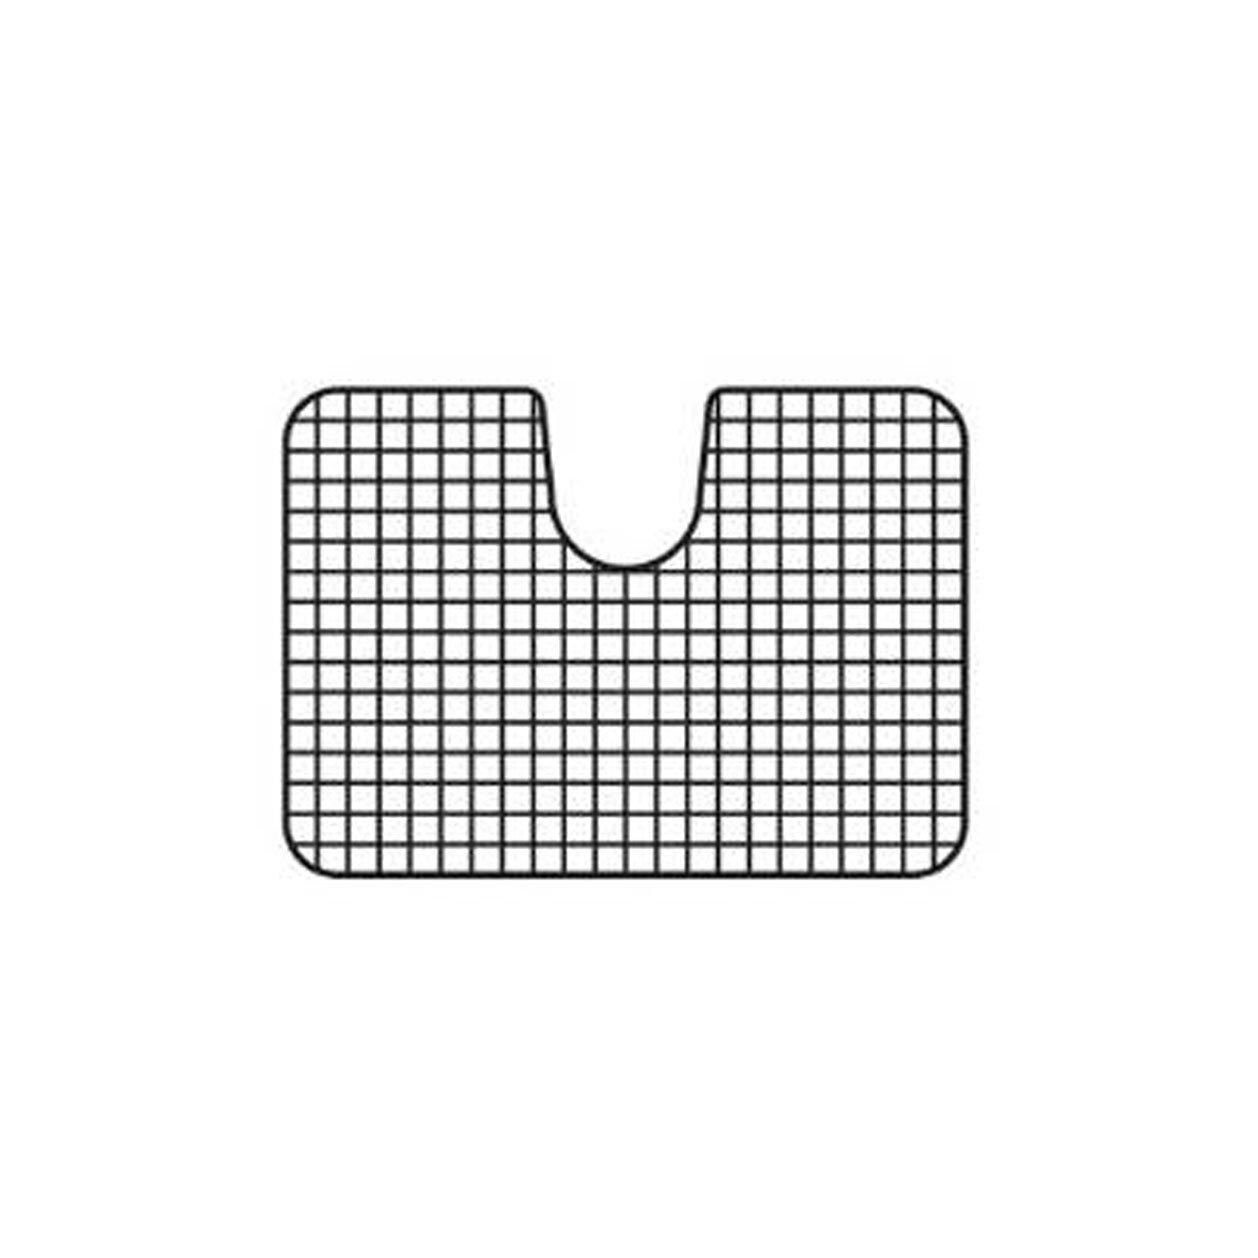 Franke Kubus Stainless Steel Top Grid by Franke